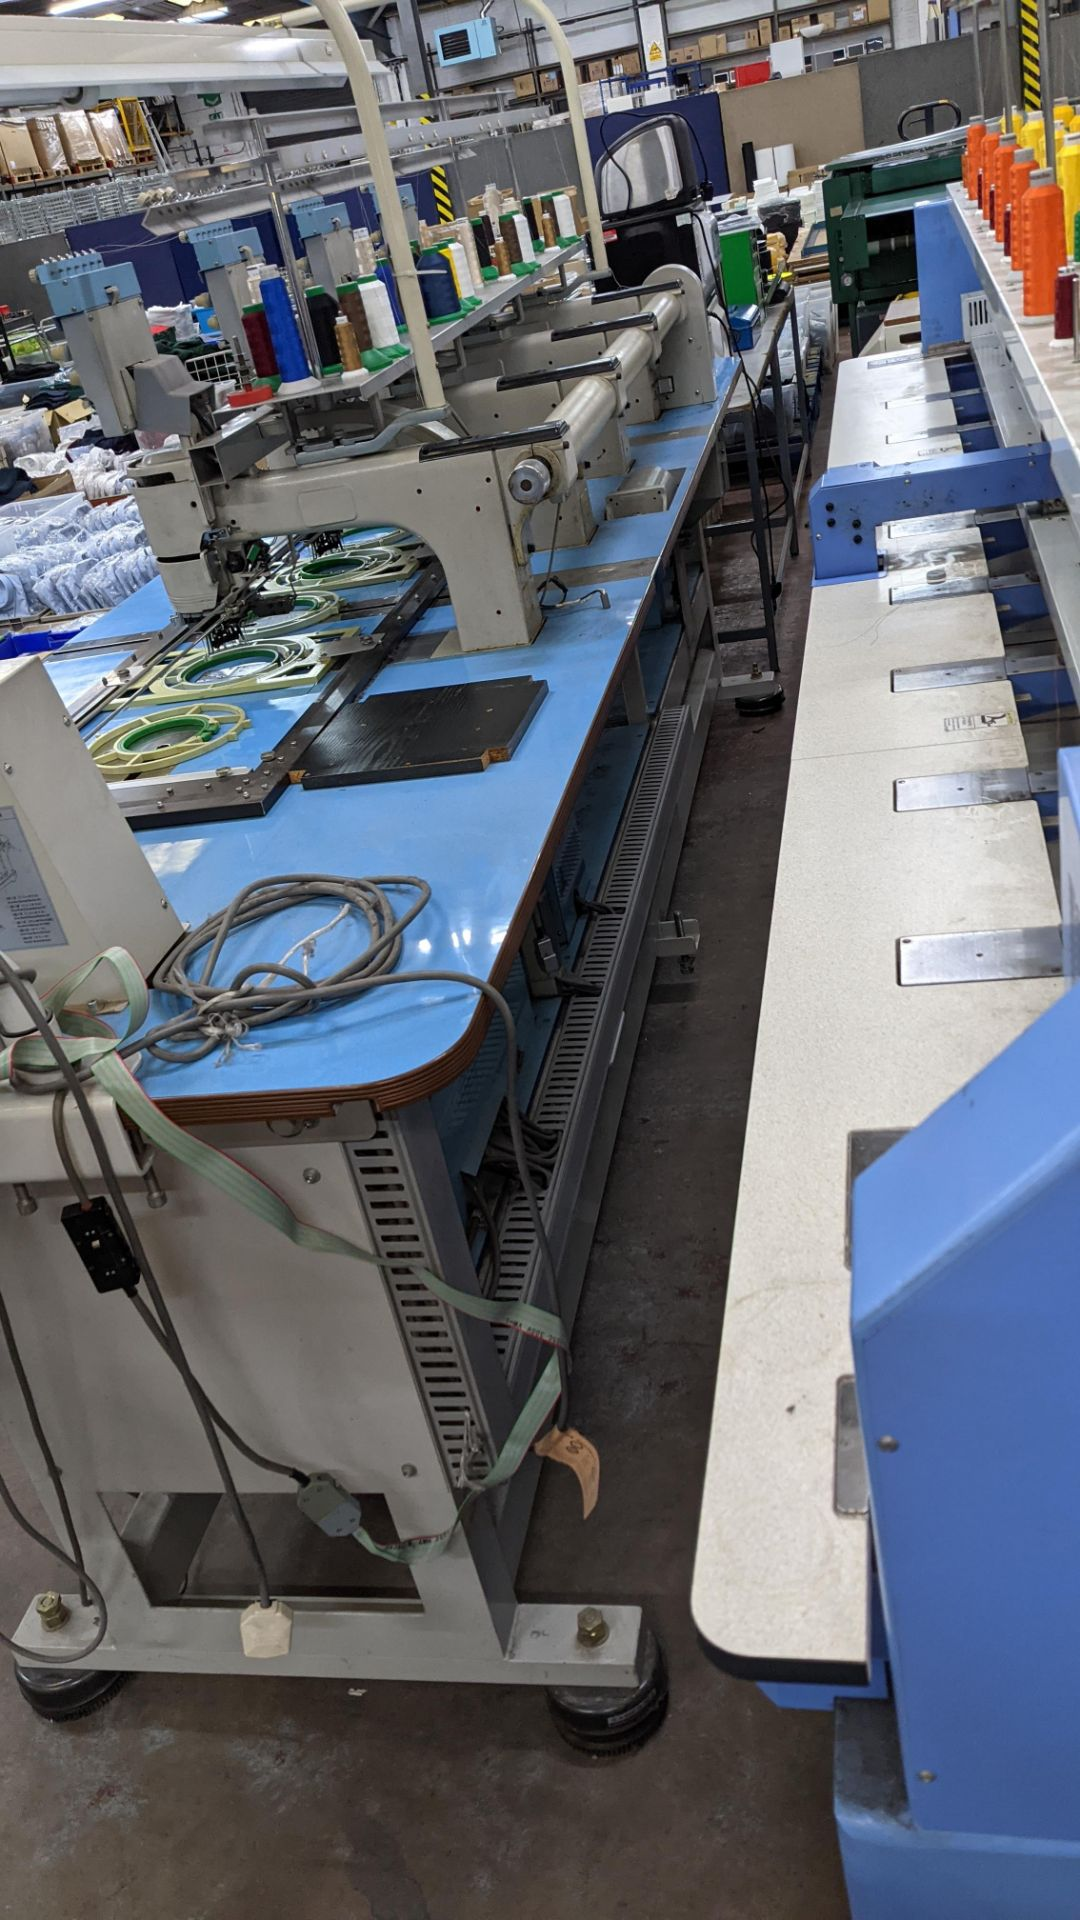 Barudan 4 head embroidery machine, model BEAT 804TYS, 7 needles per head - Image 22 of 24